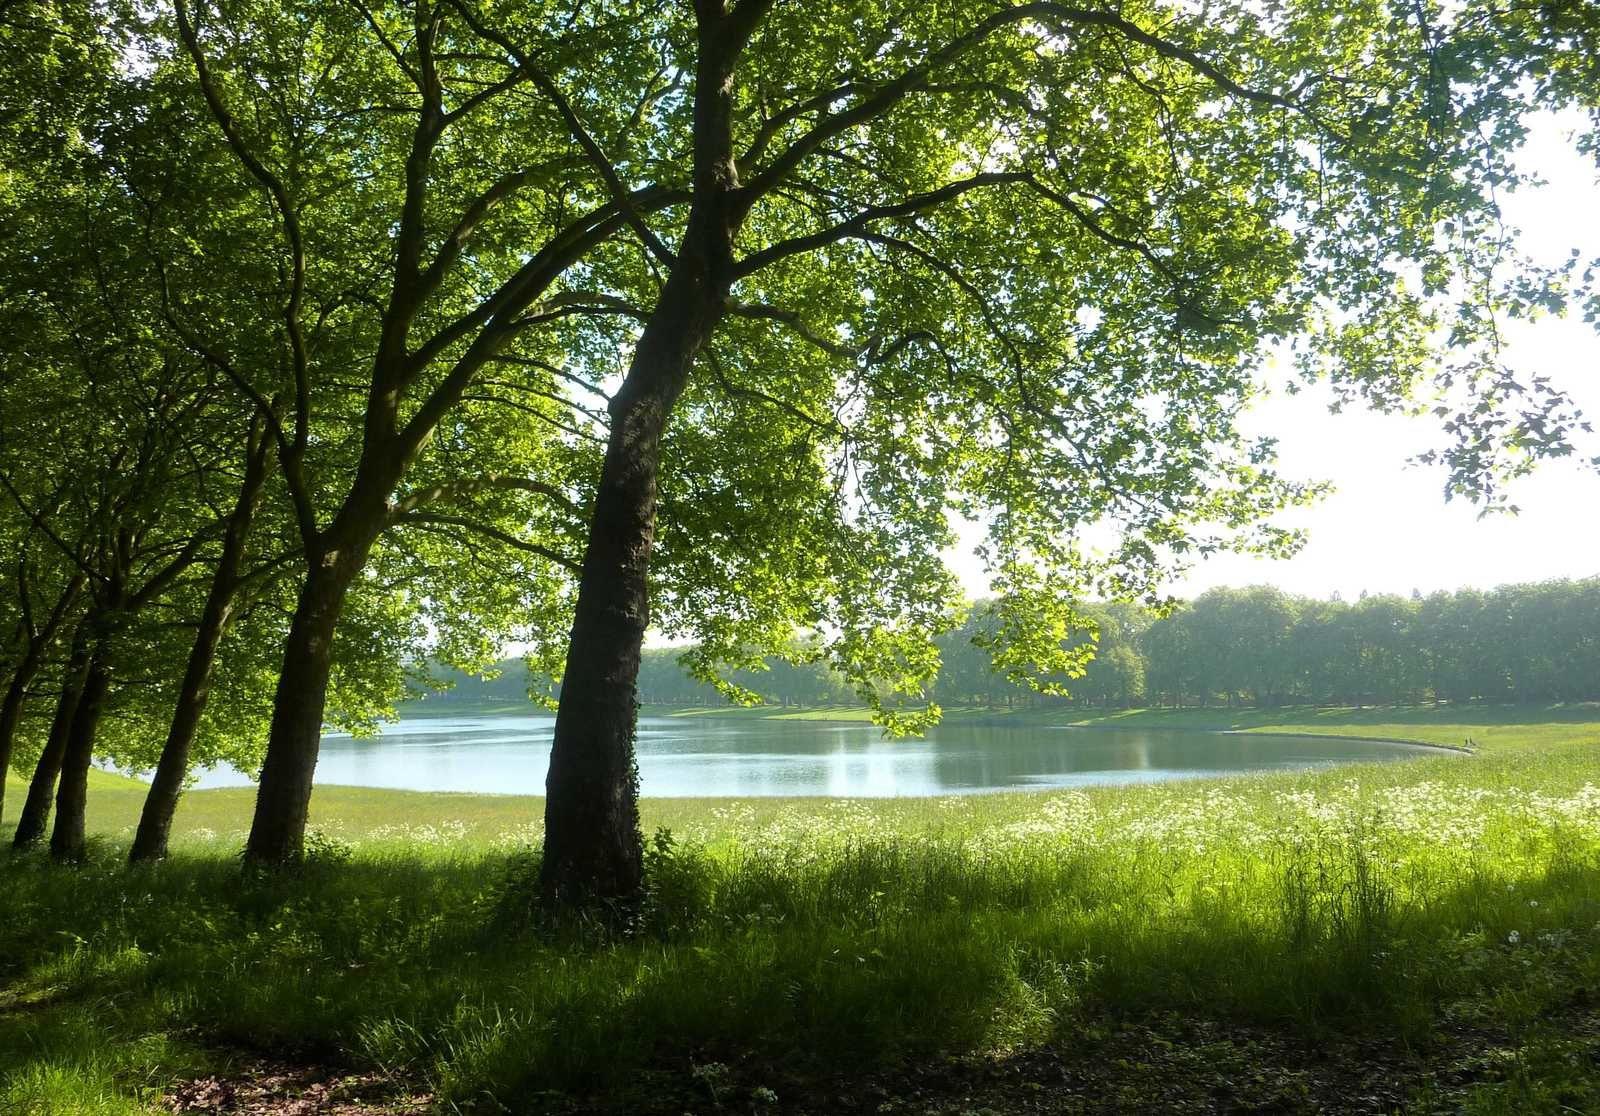 17 mai 2015 - Versailles